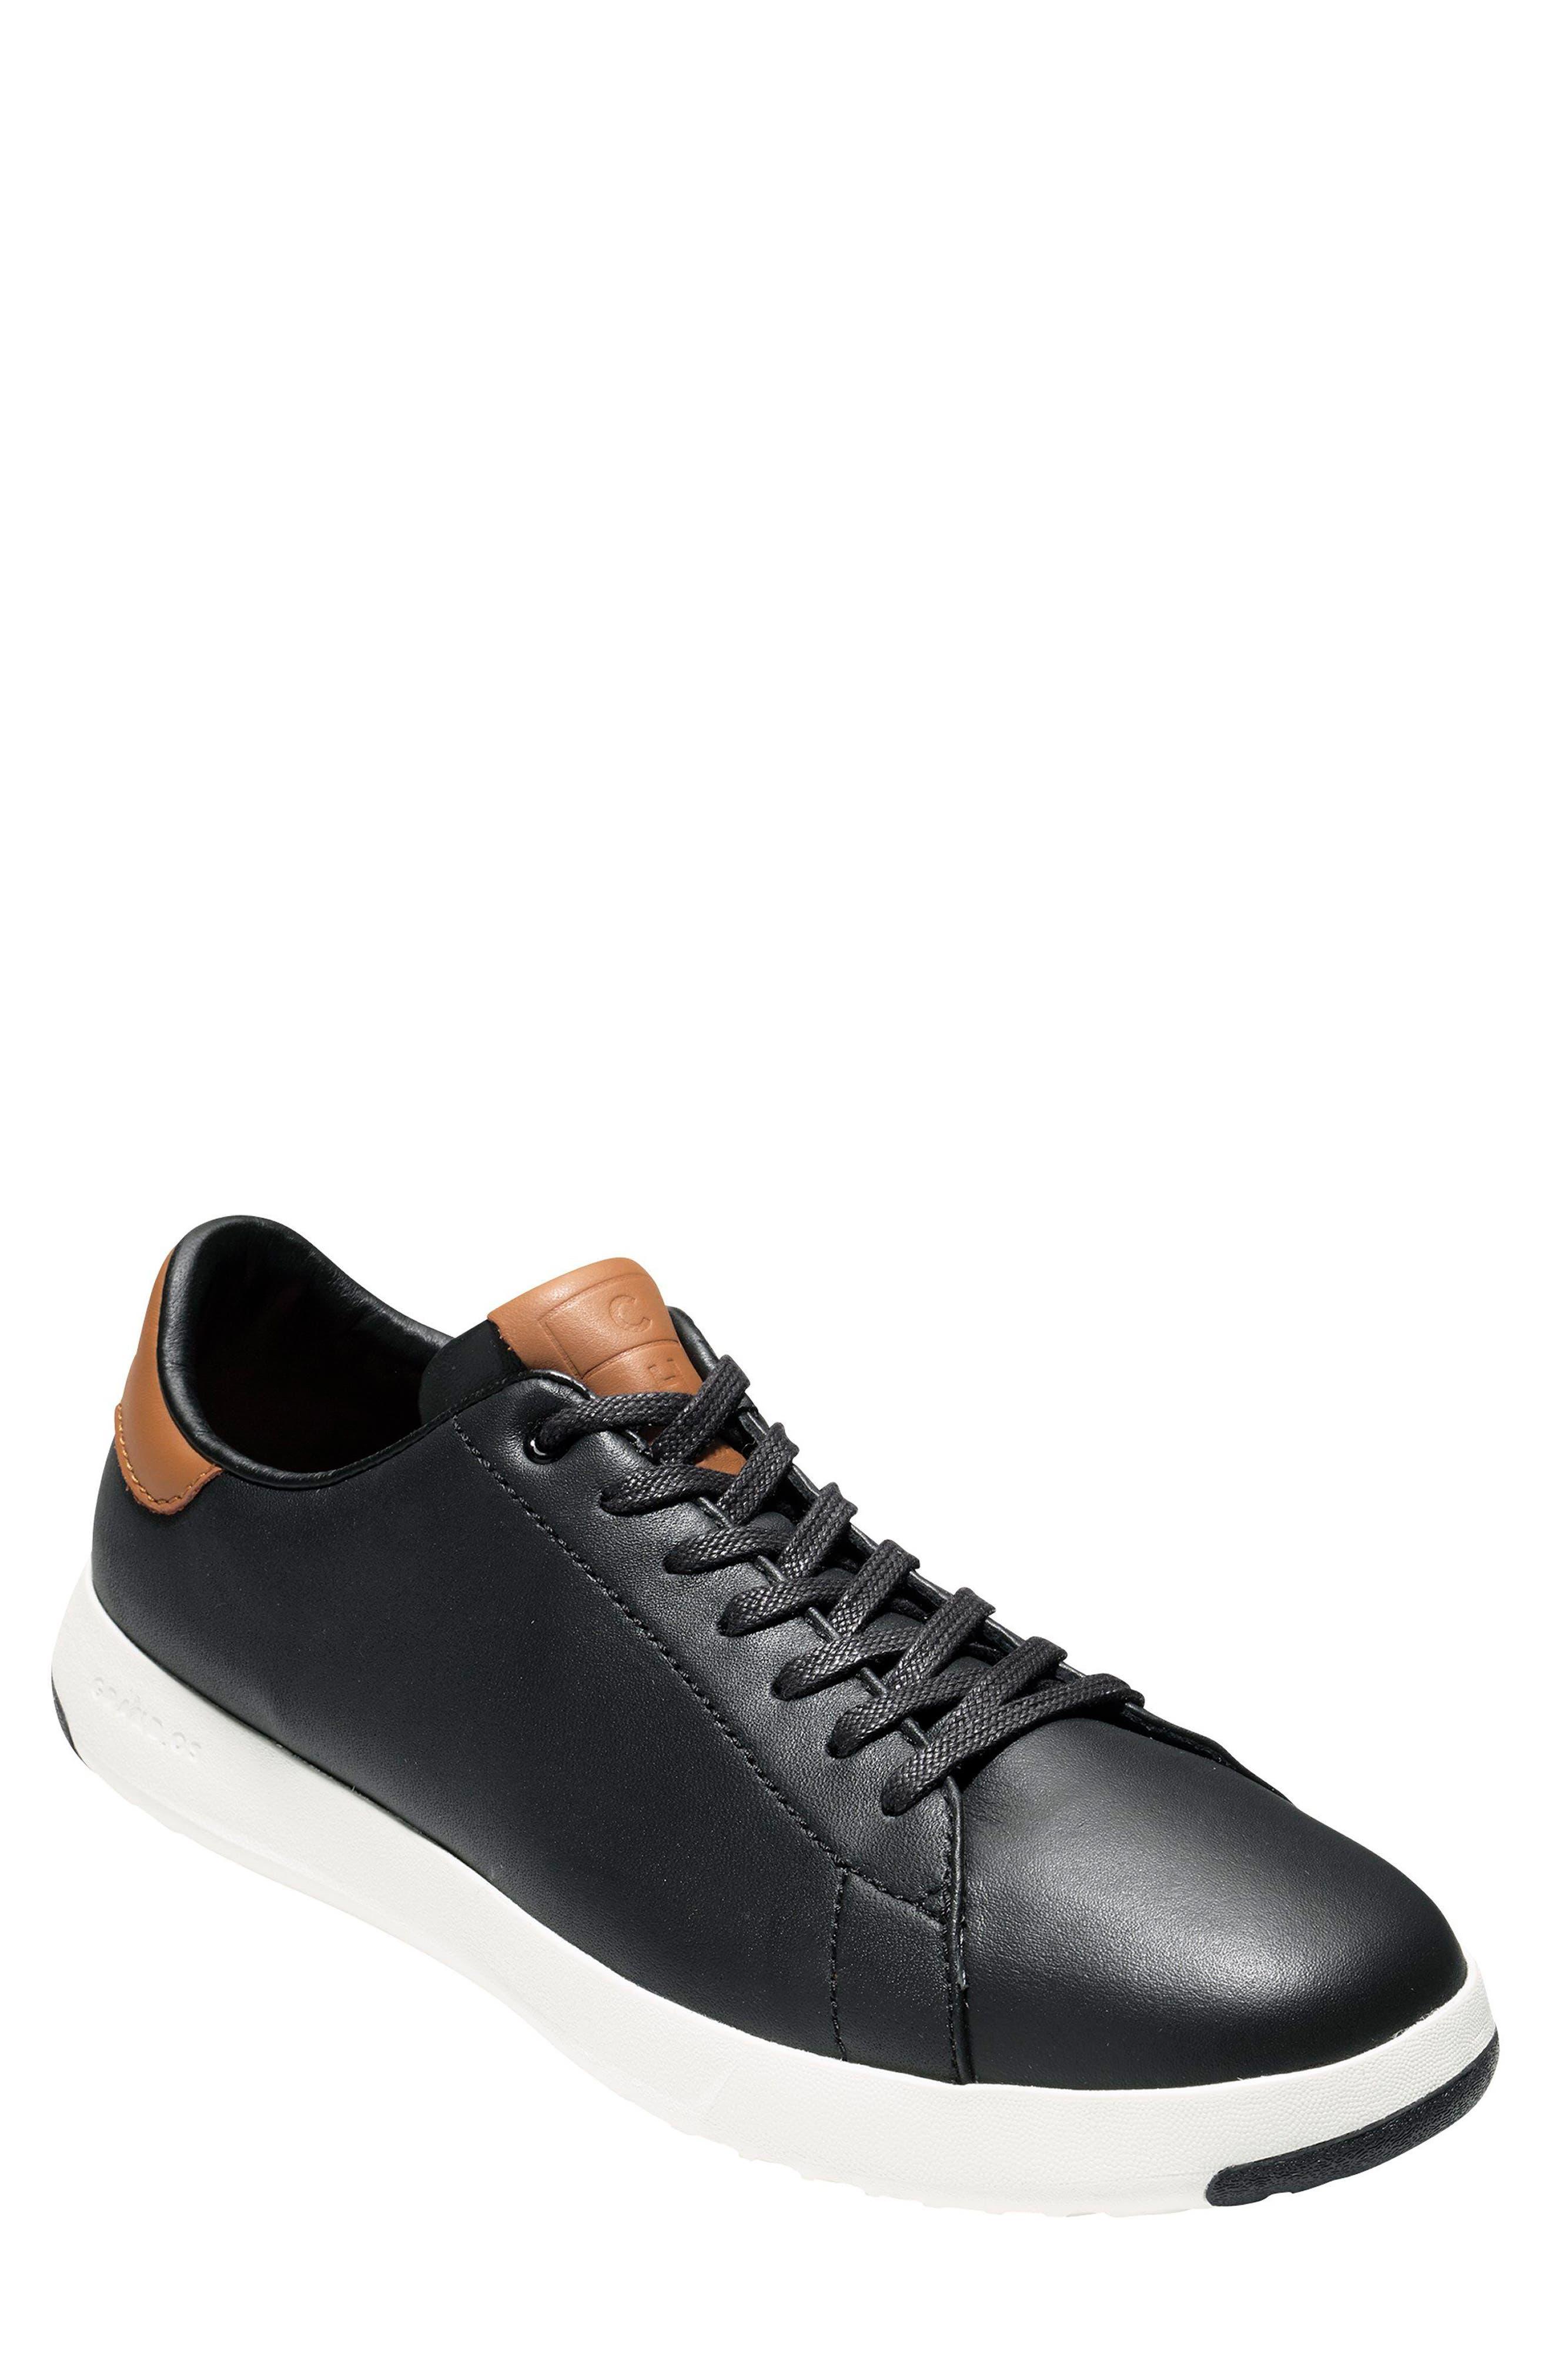 COLE HAAN GrandPro Tennis Sneaker, Main, color, BLACK/ BRITISH TAN